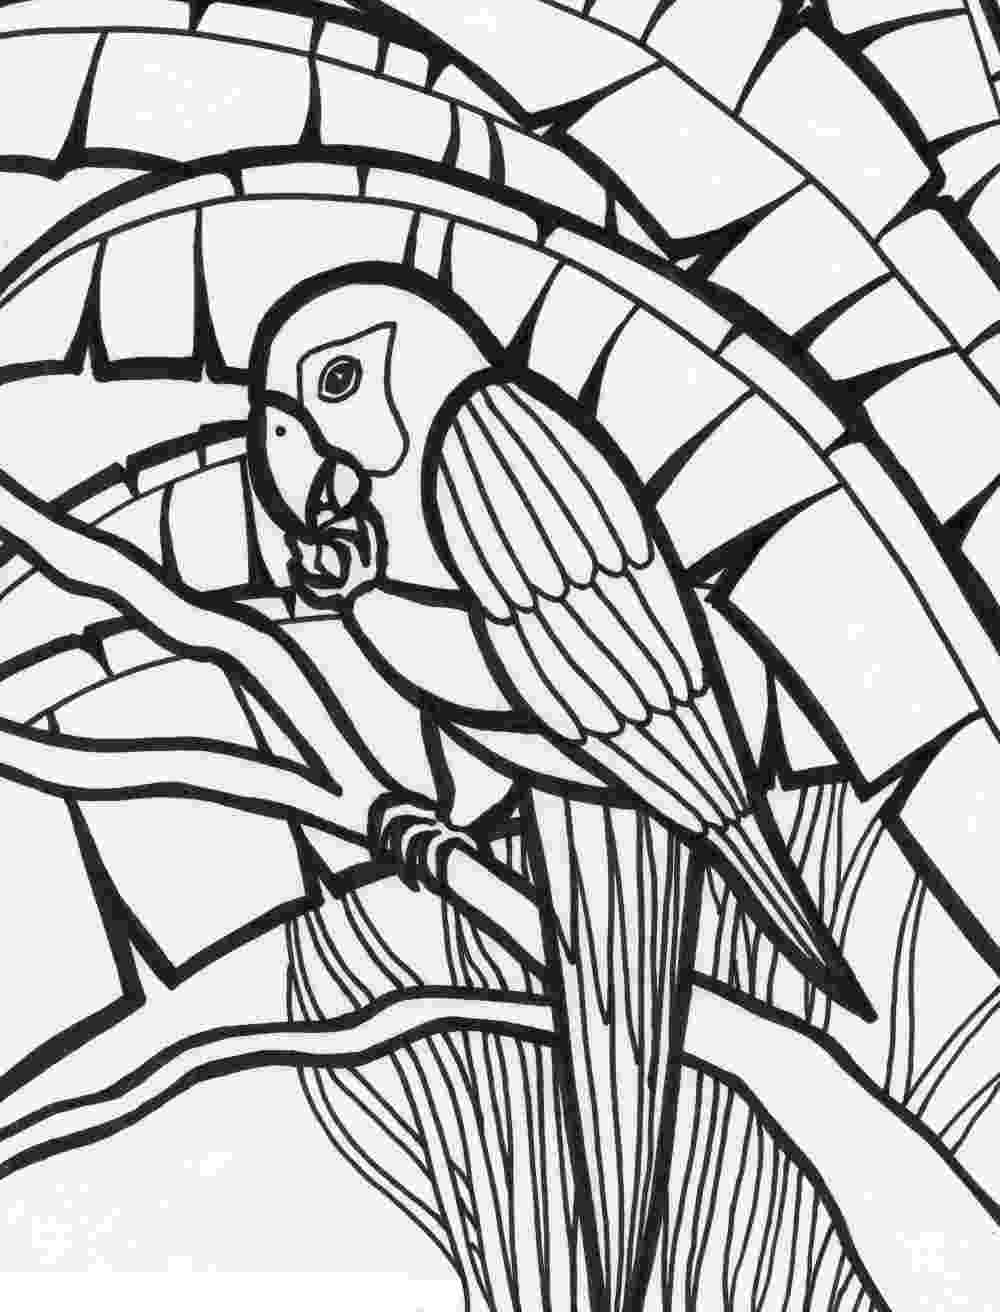 parrot coloring pages printable parrot coloring pages for kids cool2bkids coloring pages parrot 1 2